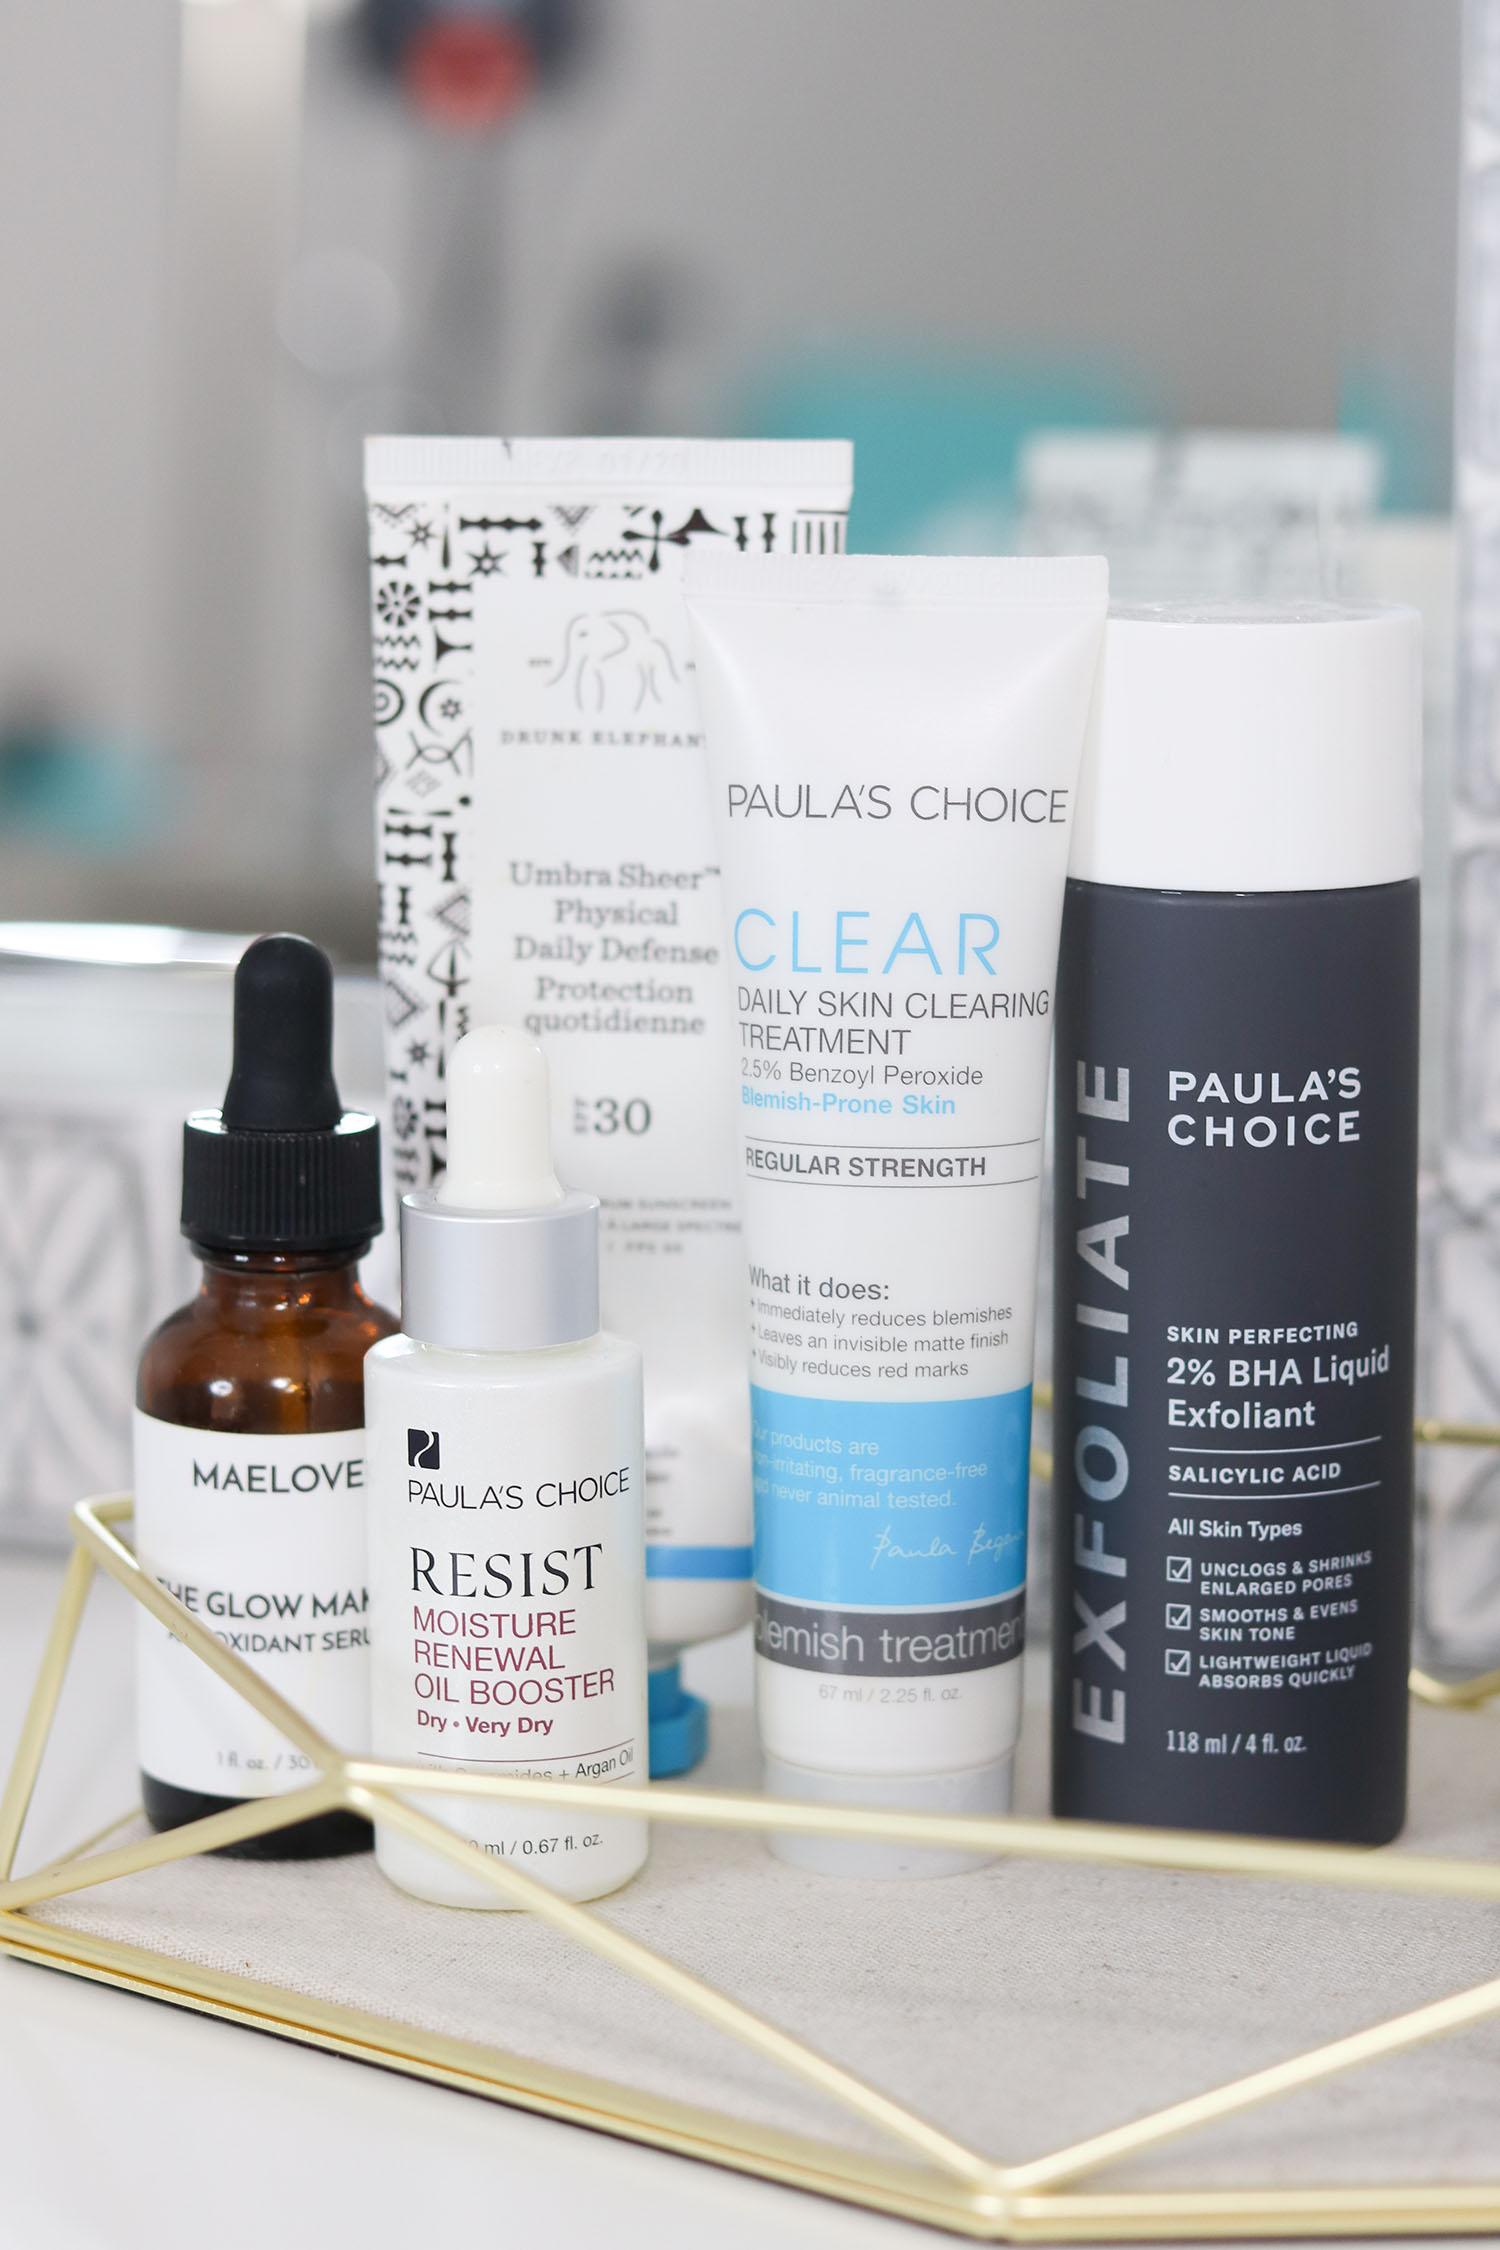 How I Clear My Skin When I'm Having a Breakout | Paula's Choice 2% BHA Liquid Exfoliant, Paula's Choice Skin Clearing Treatment, Paula's Choice Moisture Renewal Oil